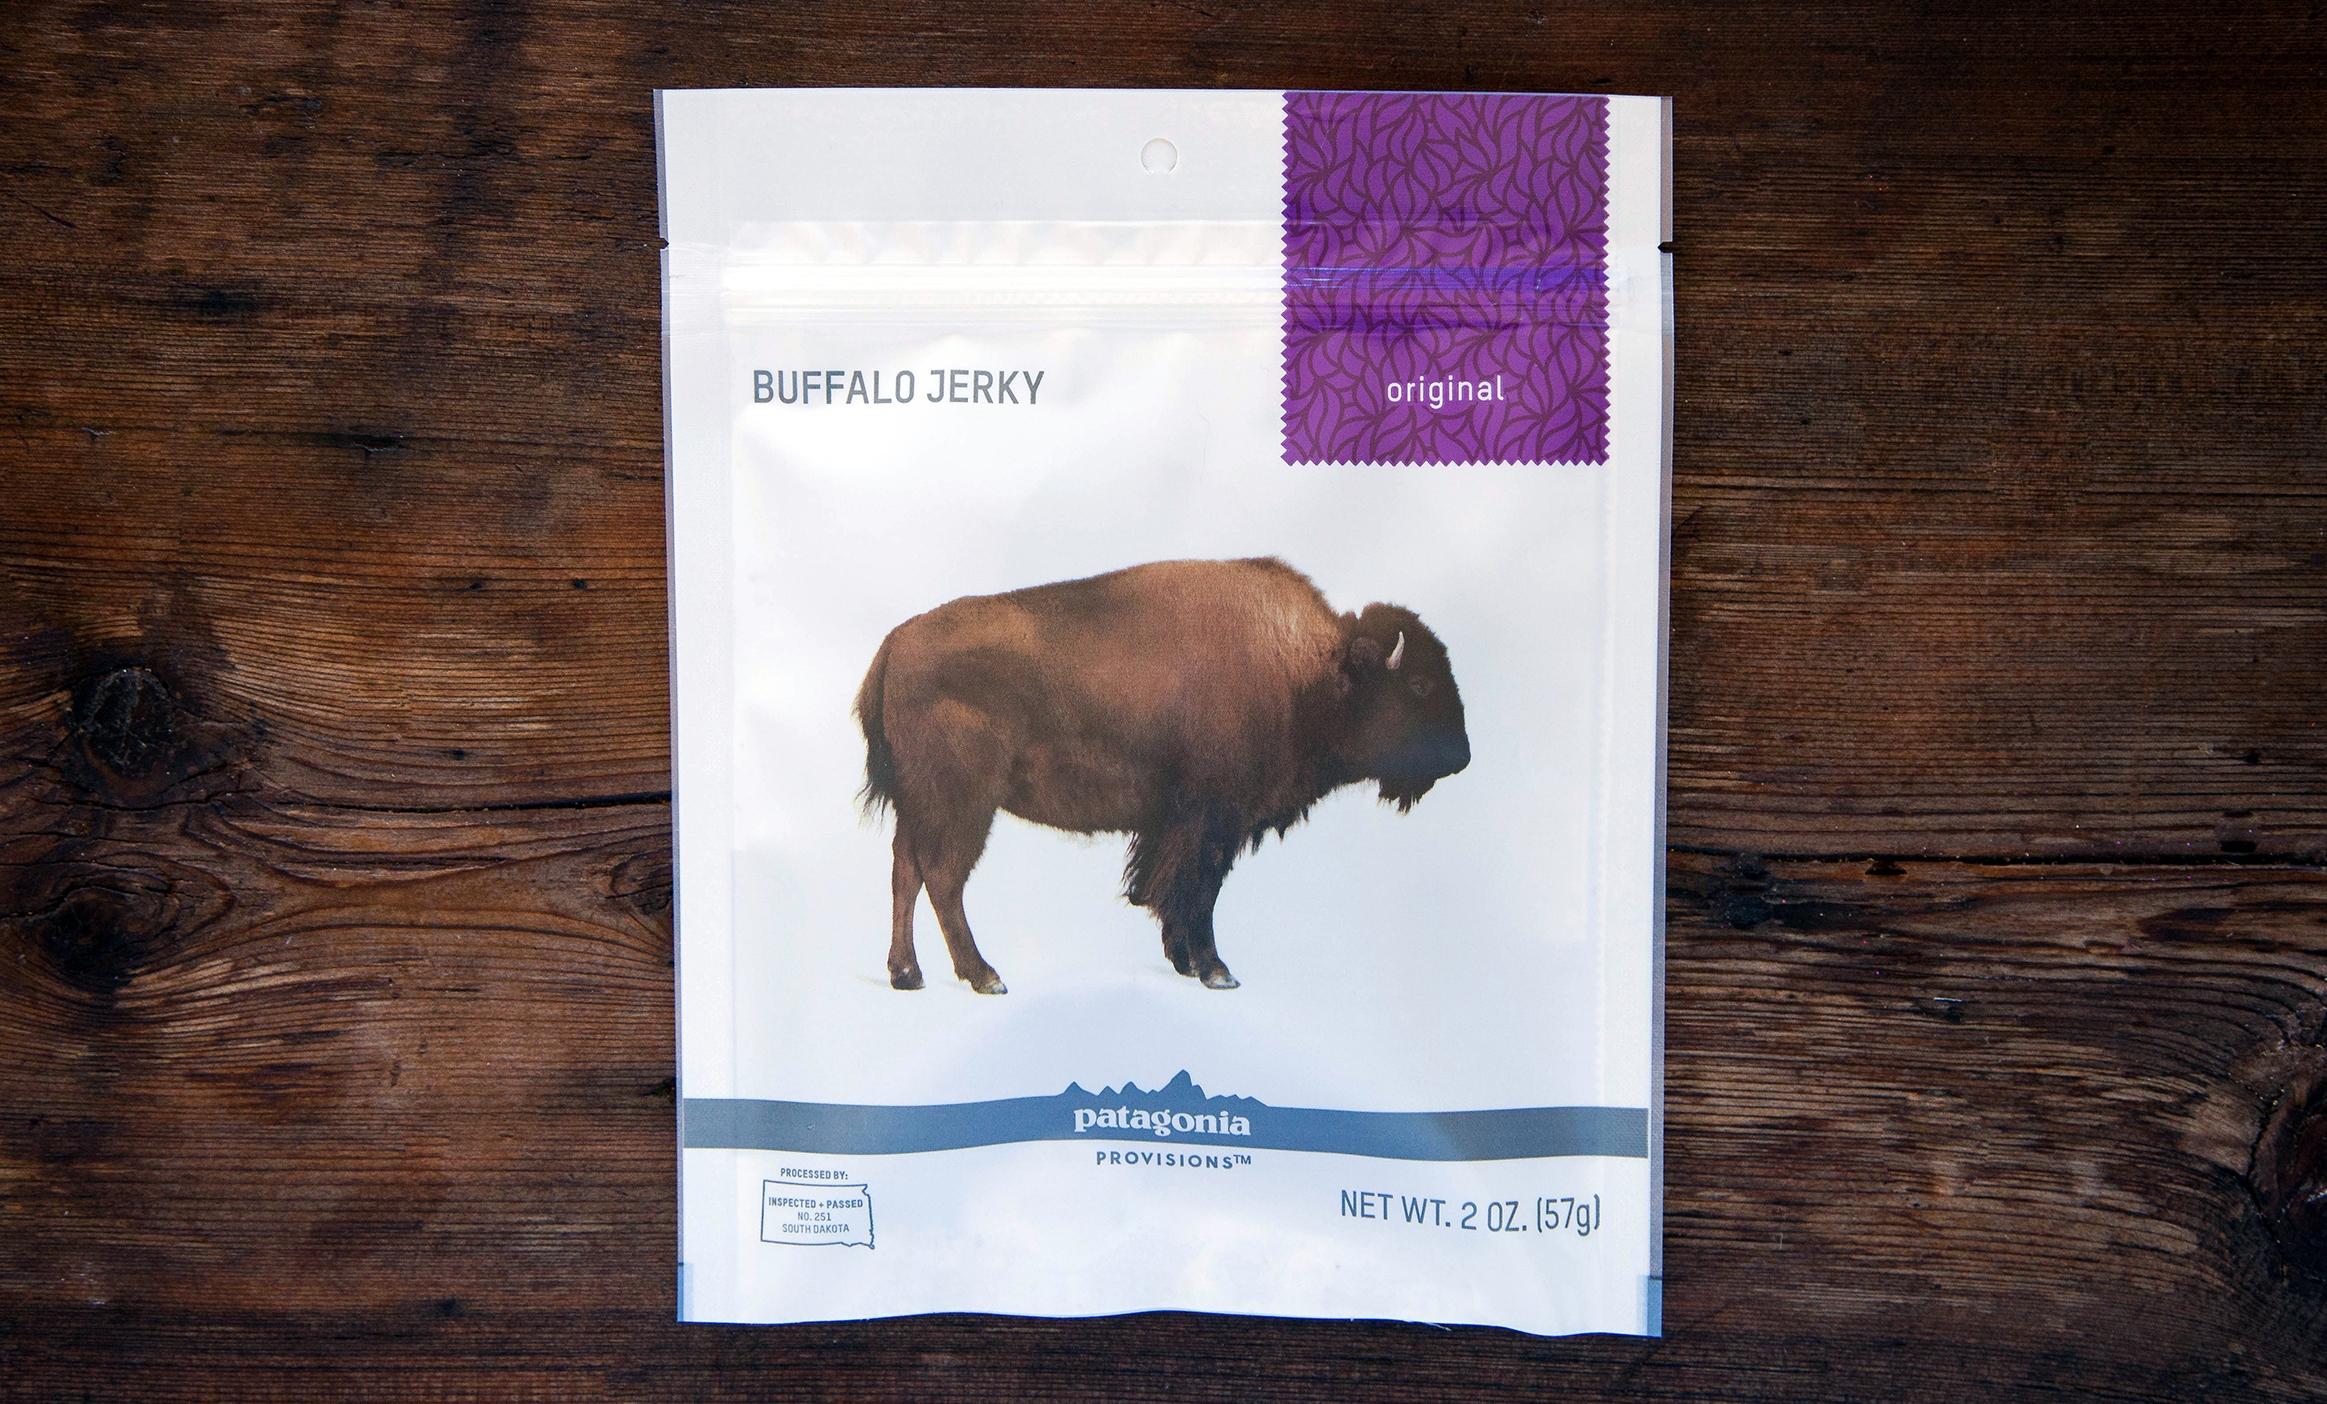 PatagoniaProvisions-Buffalo-Jerkey-Packaging-Back_Photo-Credit-Amy-Kumler.jpg